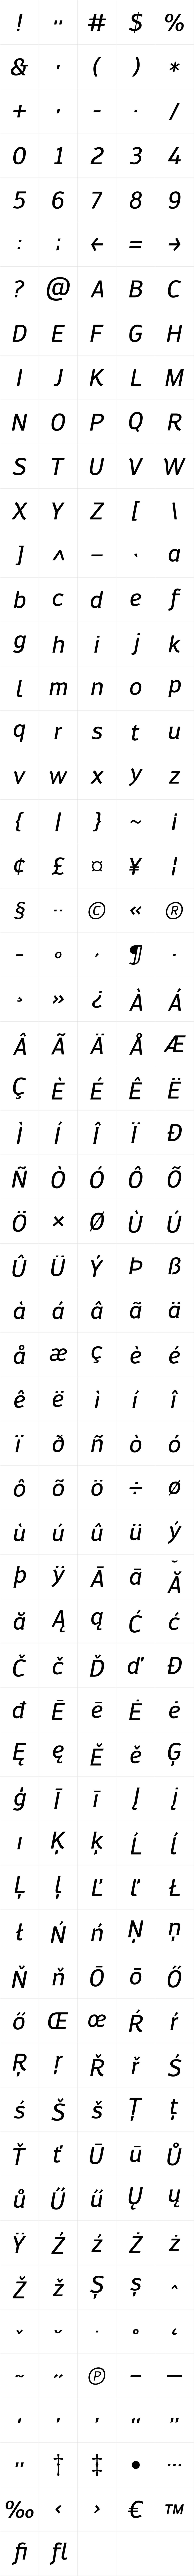 EngelNewSans MediumItalic